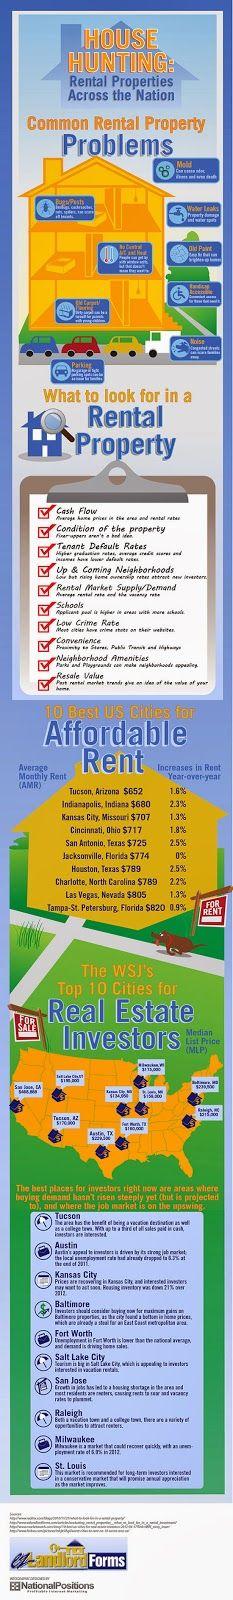 24 best real estate investing images on Pinterest Real estates - rental property analysis spreadsheet